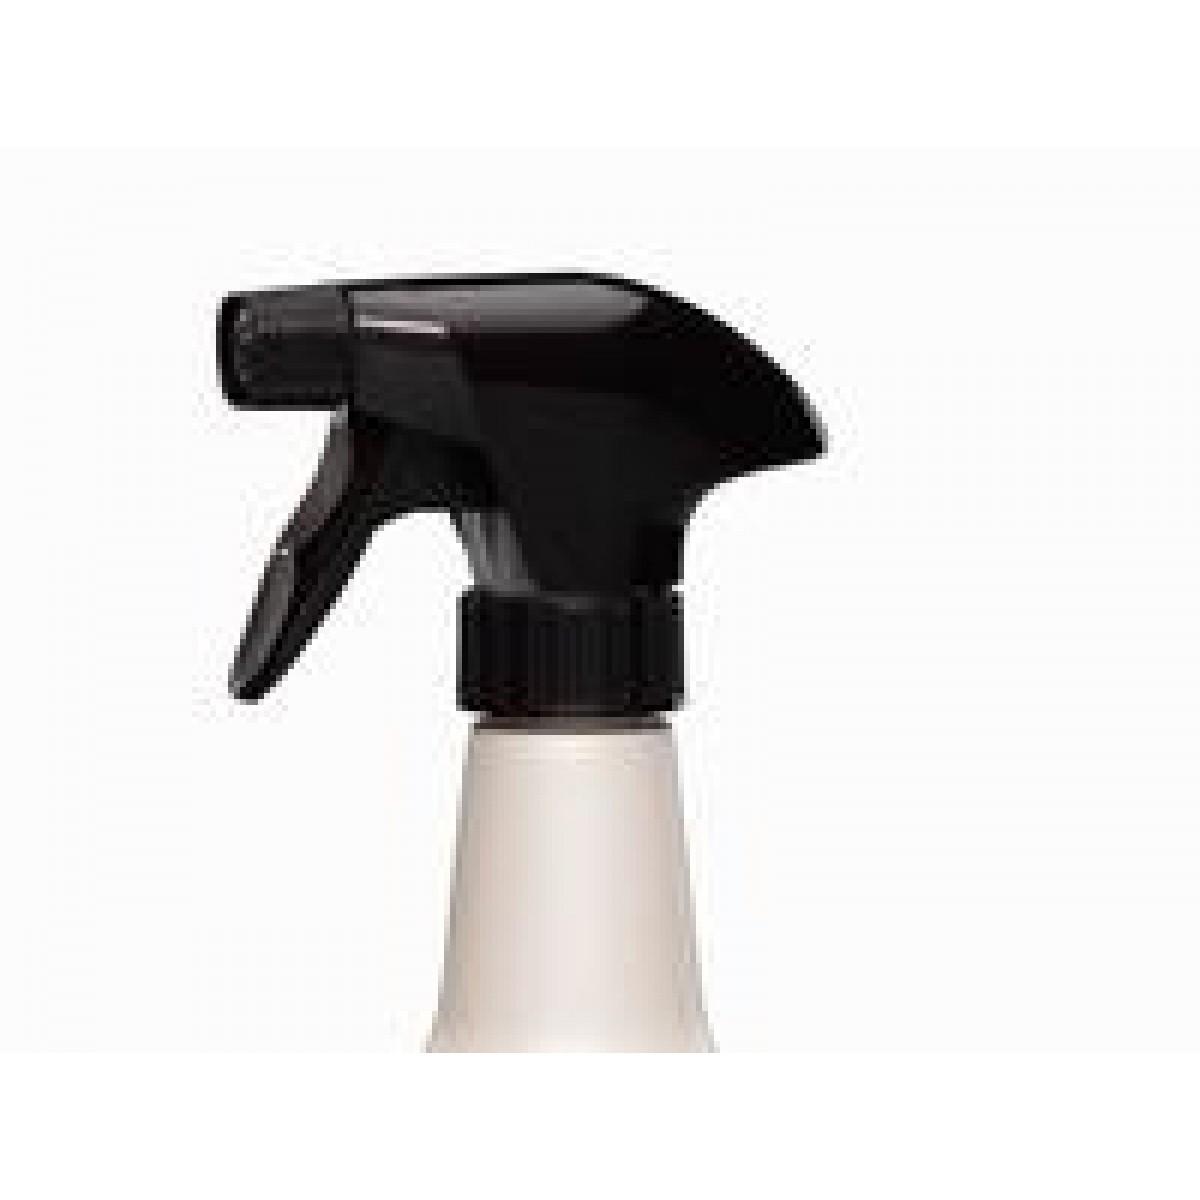 Absorbine sprayer